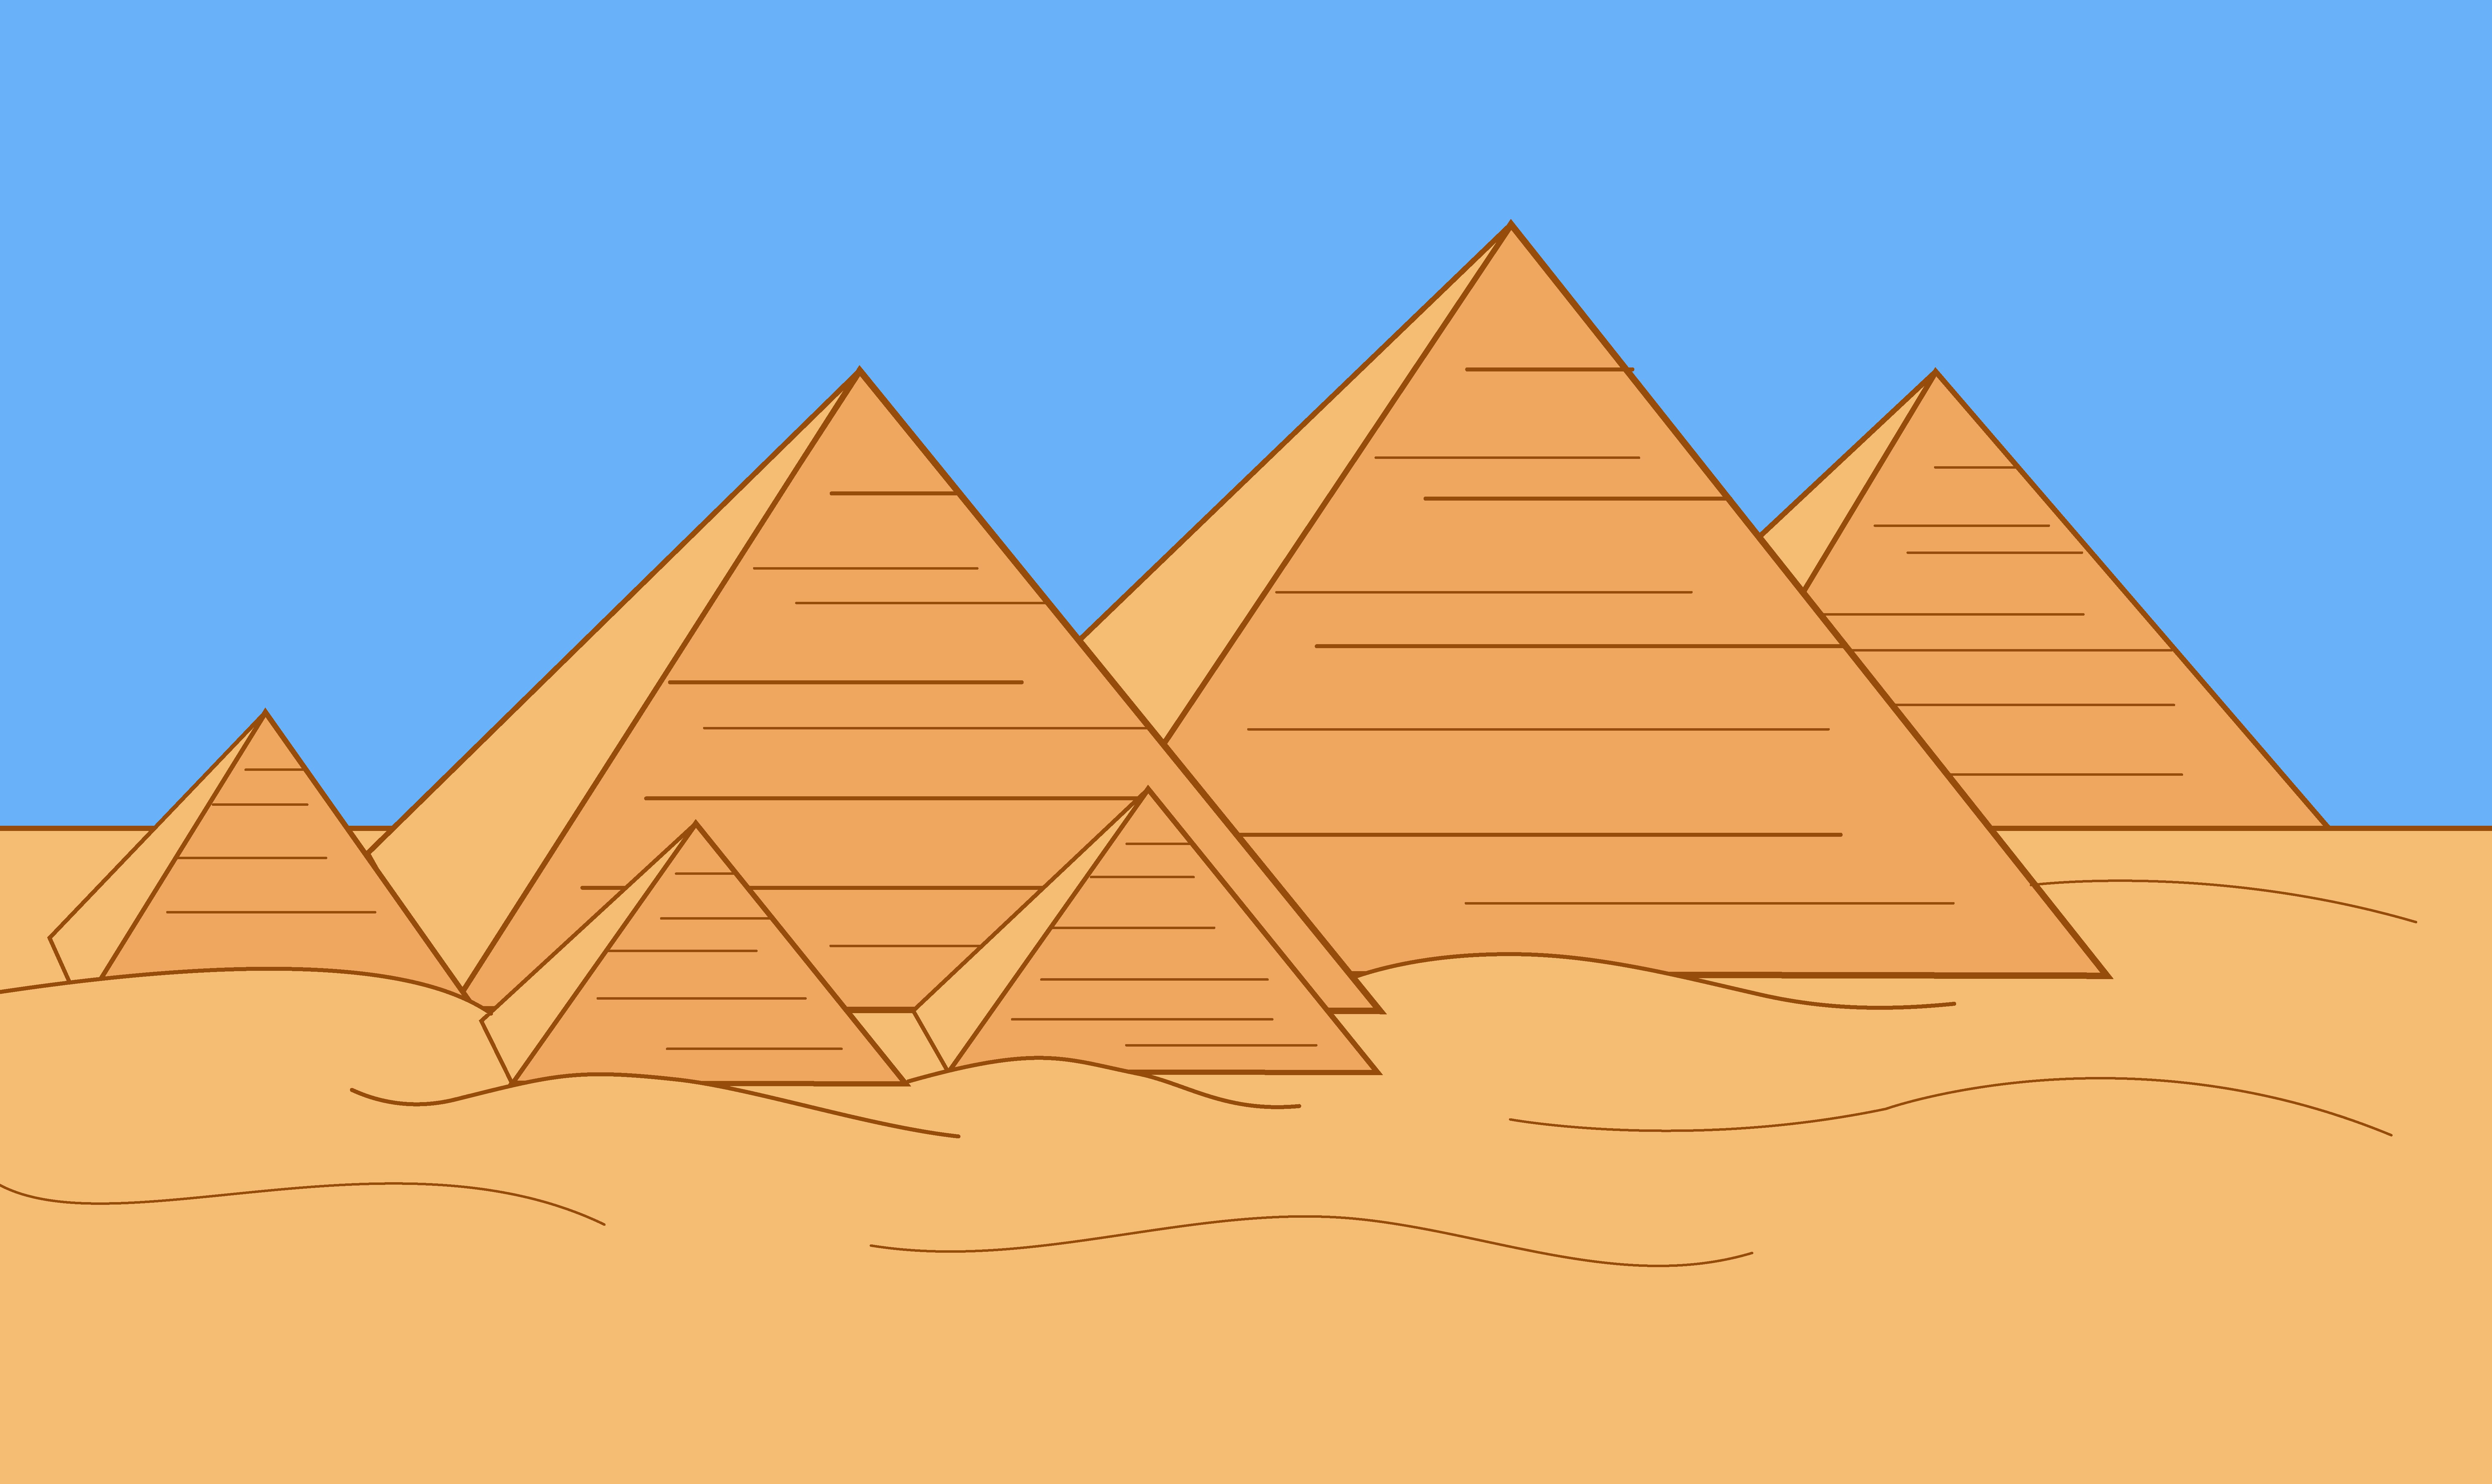 Egypt pyramid clipart royalty free stock Egyptian Pyramids of Giza - Free Clip Art royalty free stock